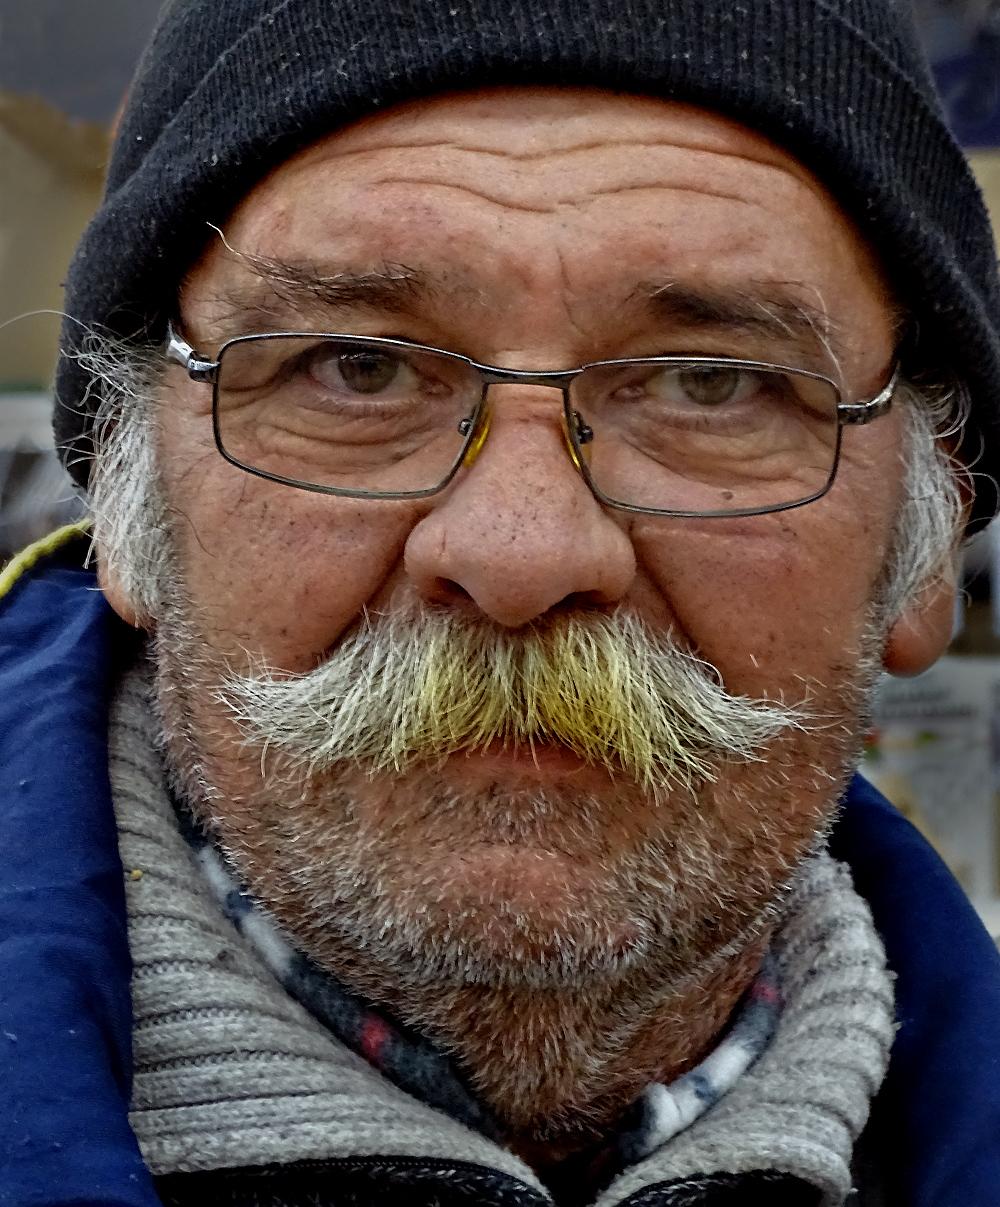 Photo in Portrait | Author Ivan Hristov - Ihif | PHOTO FORUM